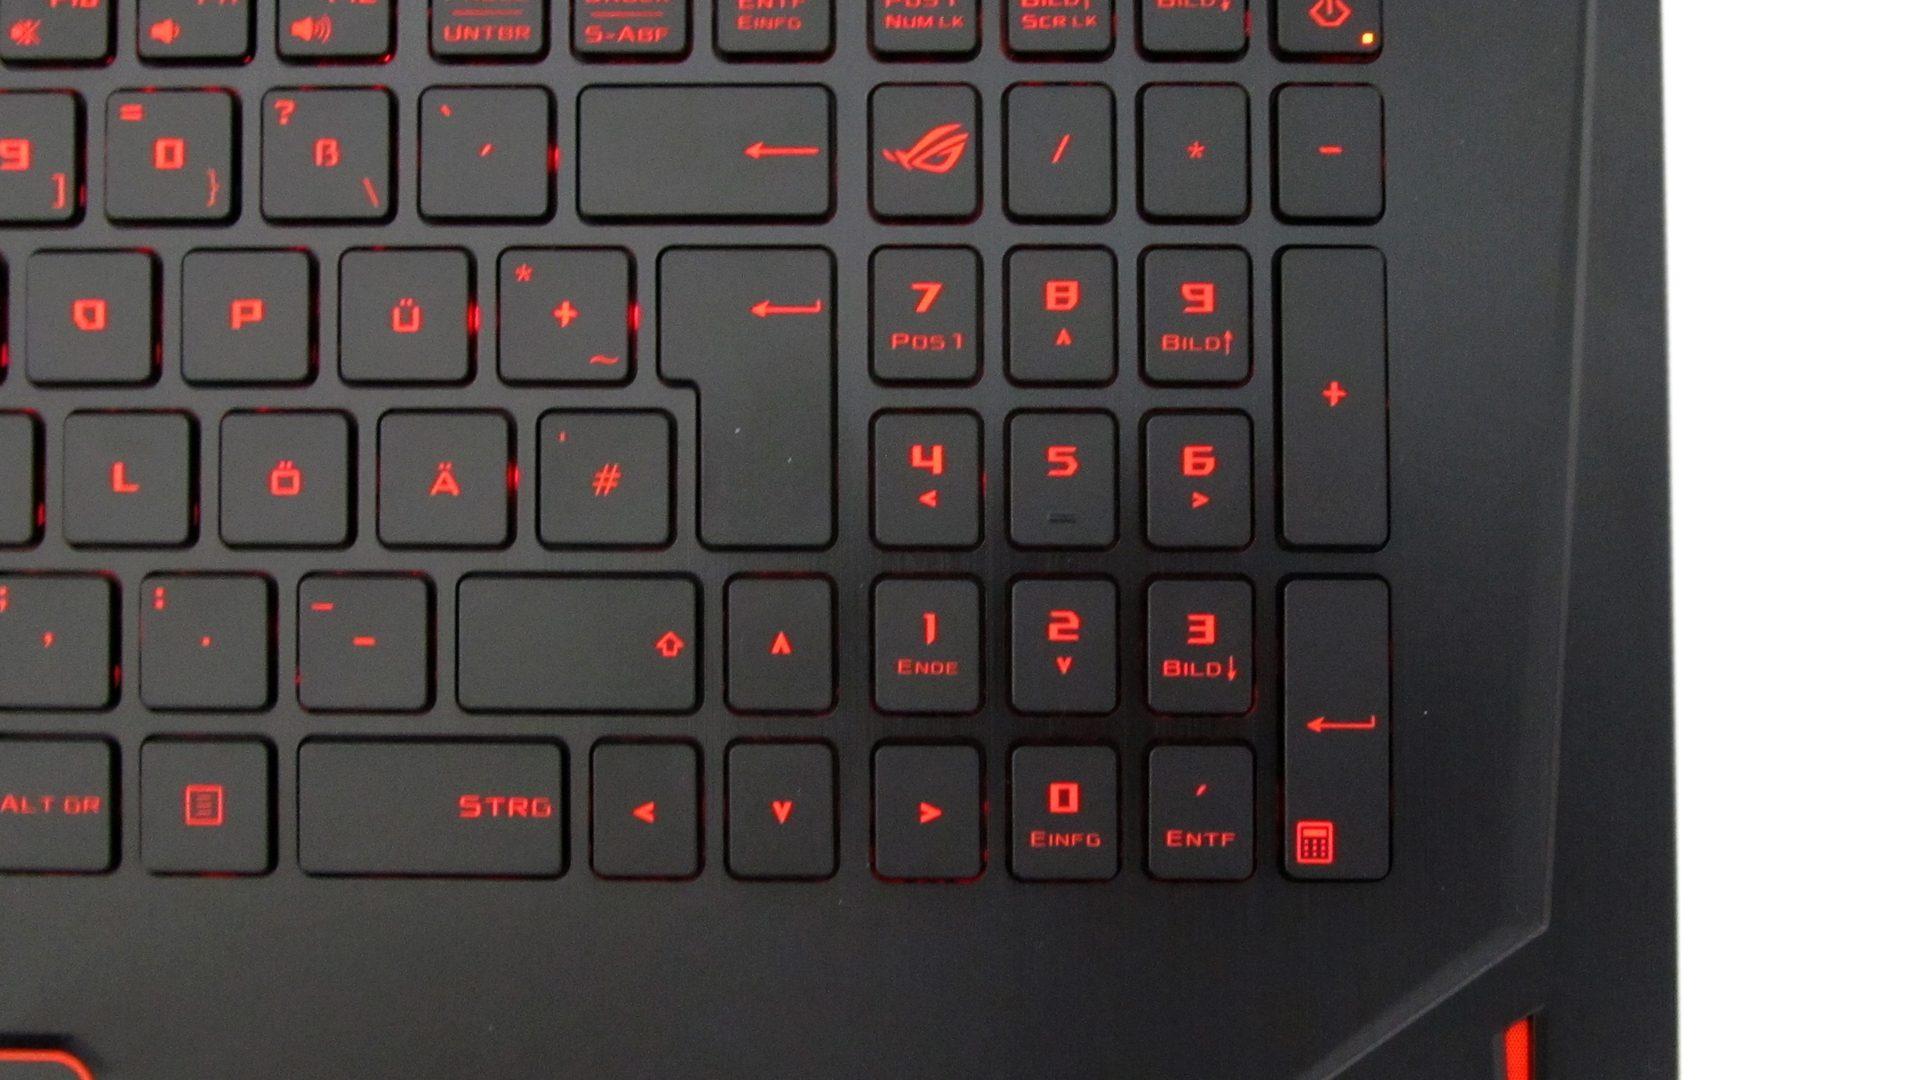 Asus-GL702VM-GC017T-Tastatur_2